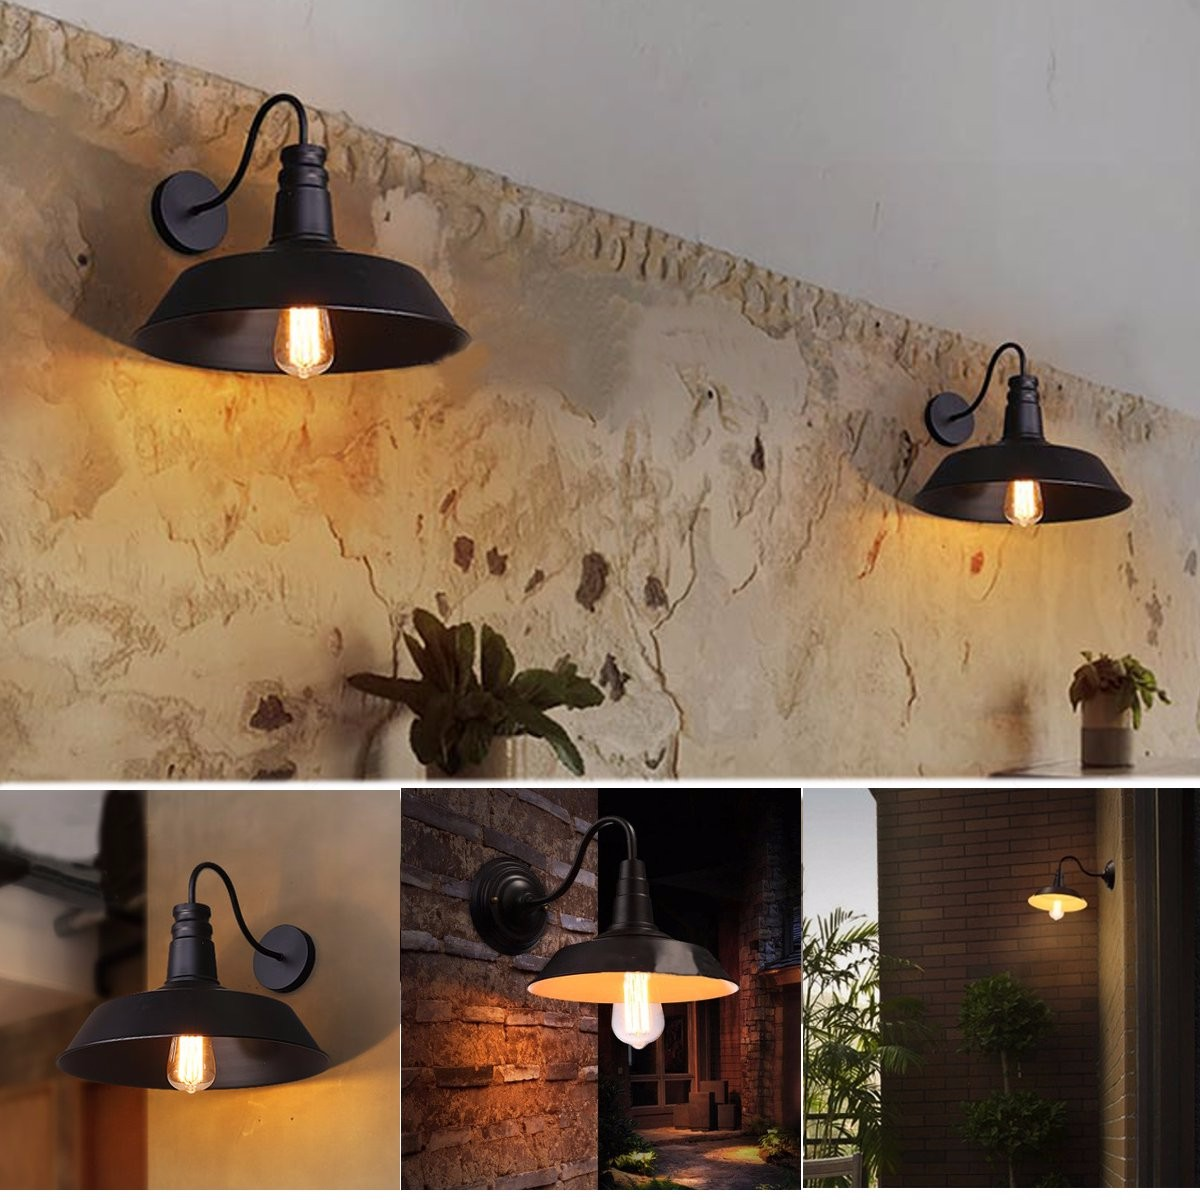 Superbe 110V Wall Mounted Hanging Retro Vintage Industrial Barn Edison Loft Light  Wall Sconce Chandelier Light Lamp Lampshade Gooseneck For Kitchen Farmhouse  ...